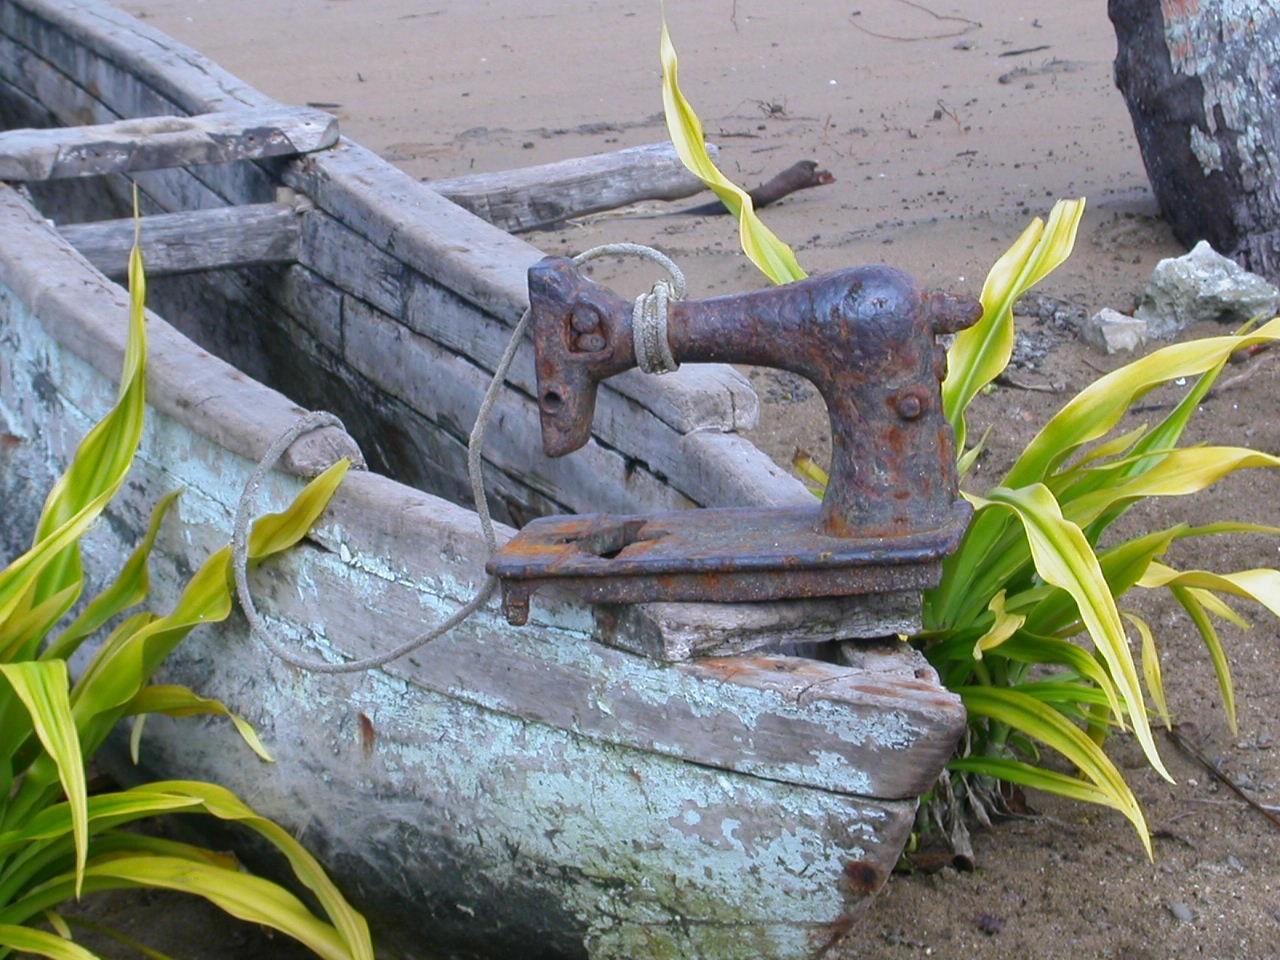 Click image for larger version  Name:improvised anchor (Vanuatu).jpg Views:177 Size:303.2 KB ID:77586